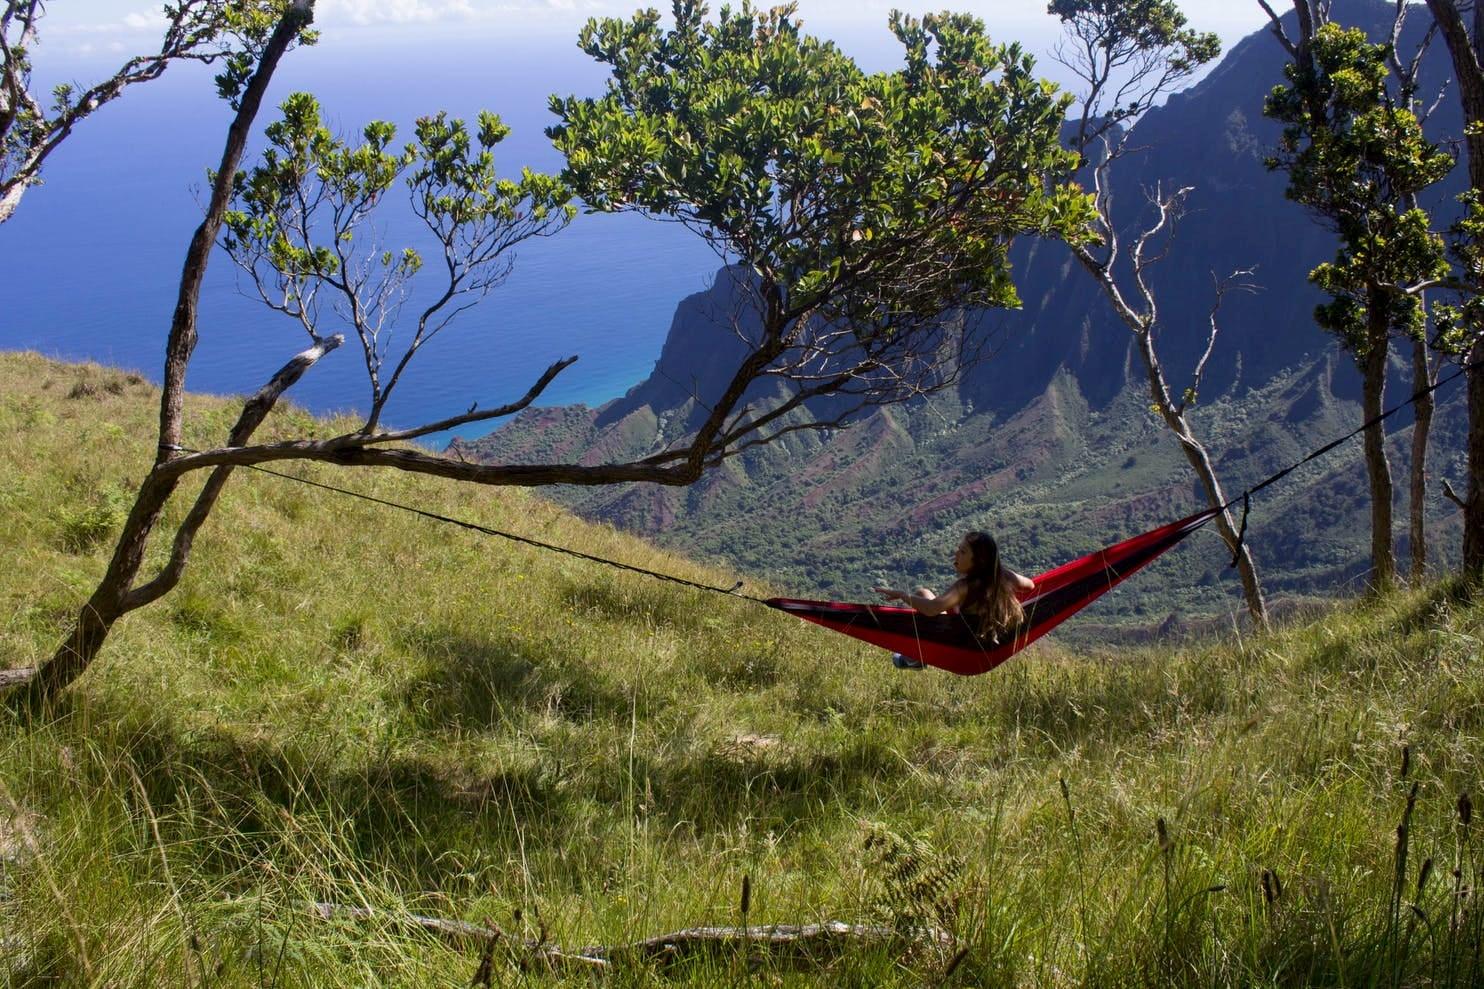 Women sitting in a hammock between two tree branches in field overlooking the ocean below.